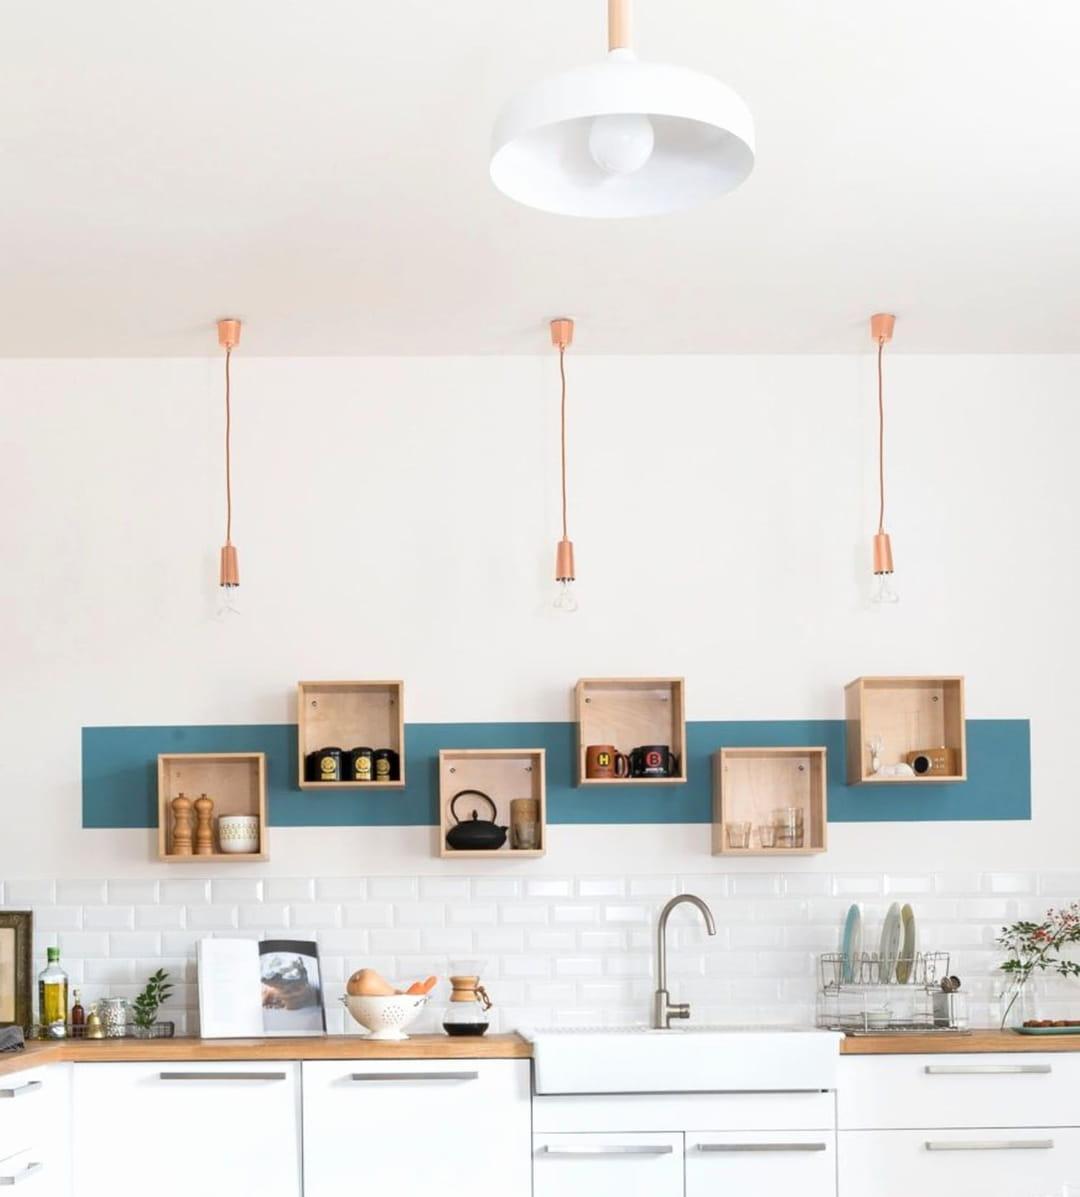 tendances d co 2019 19 inspirations d crypt es. Black Bedroom Furniture Sets. Home Design Ideas